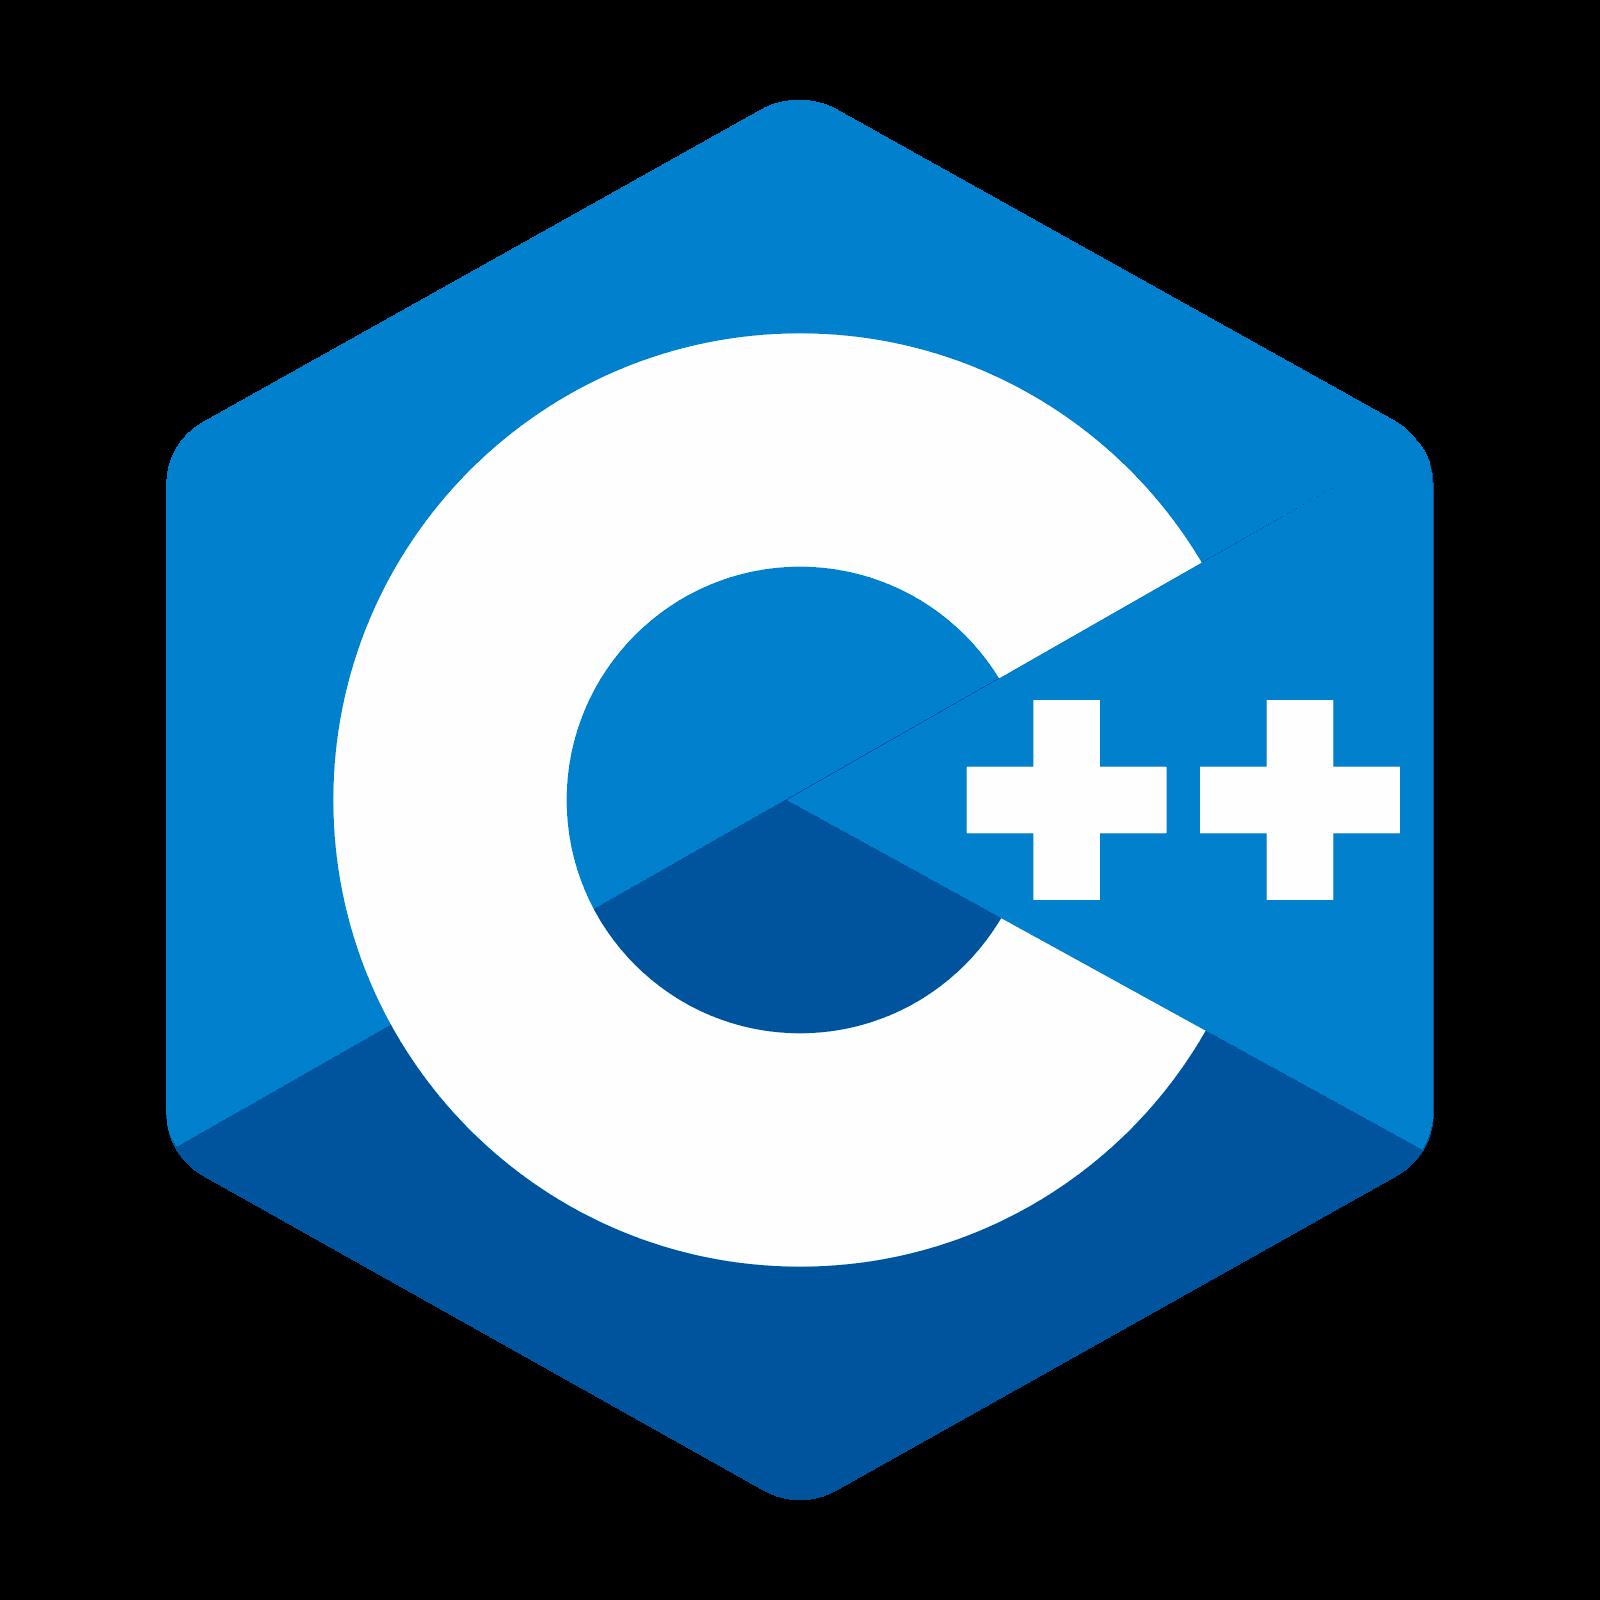 c-plus-plus-logo.png